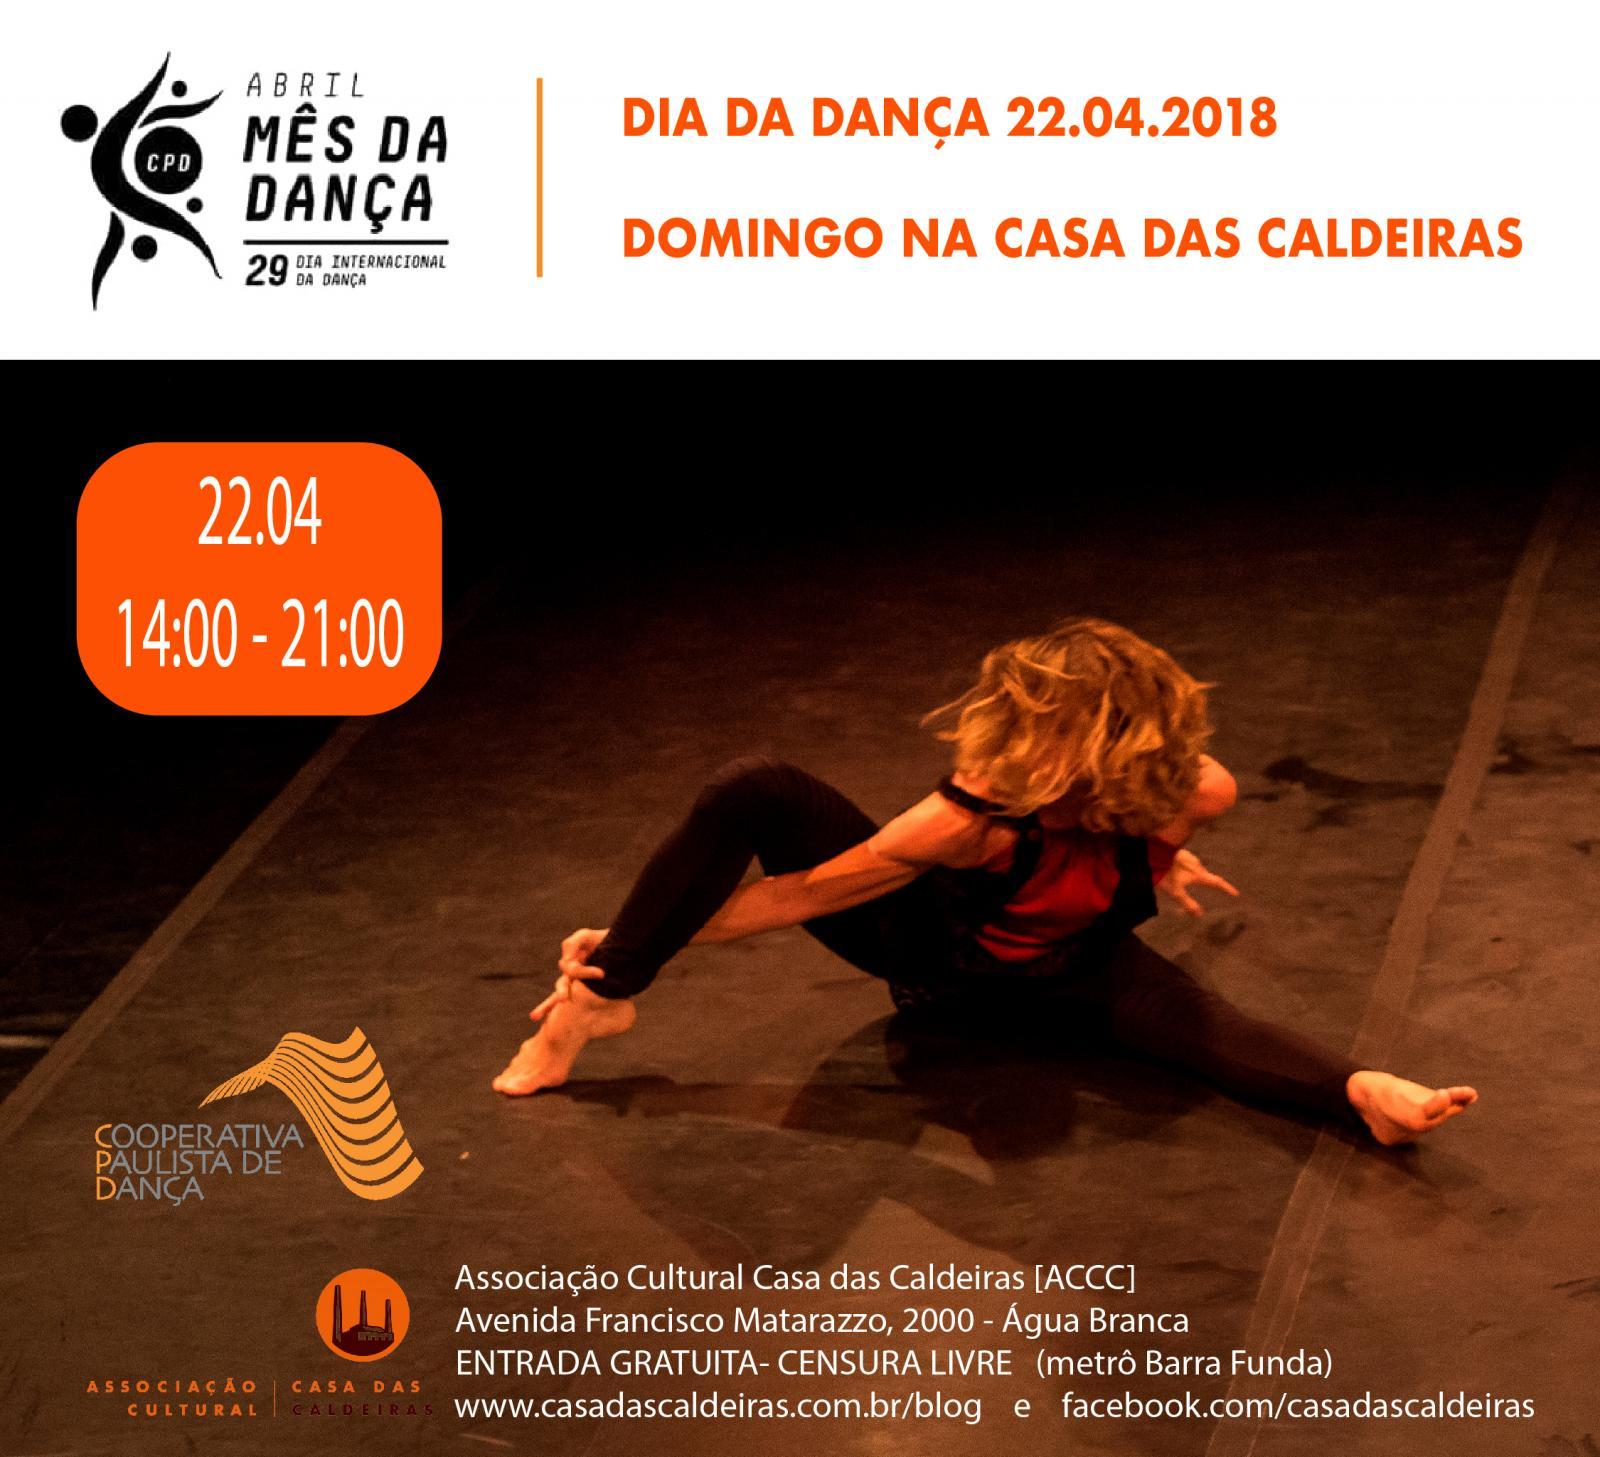 Dia da Dança - 22.04